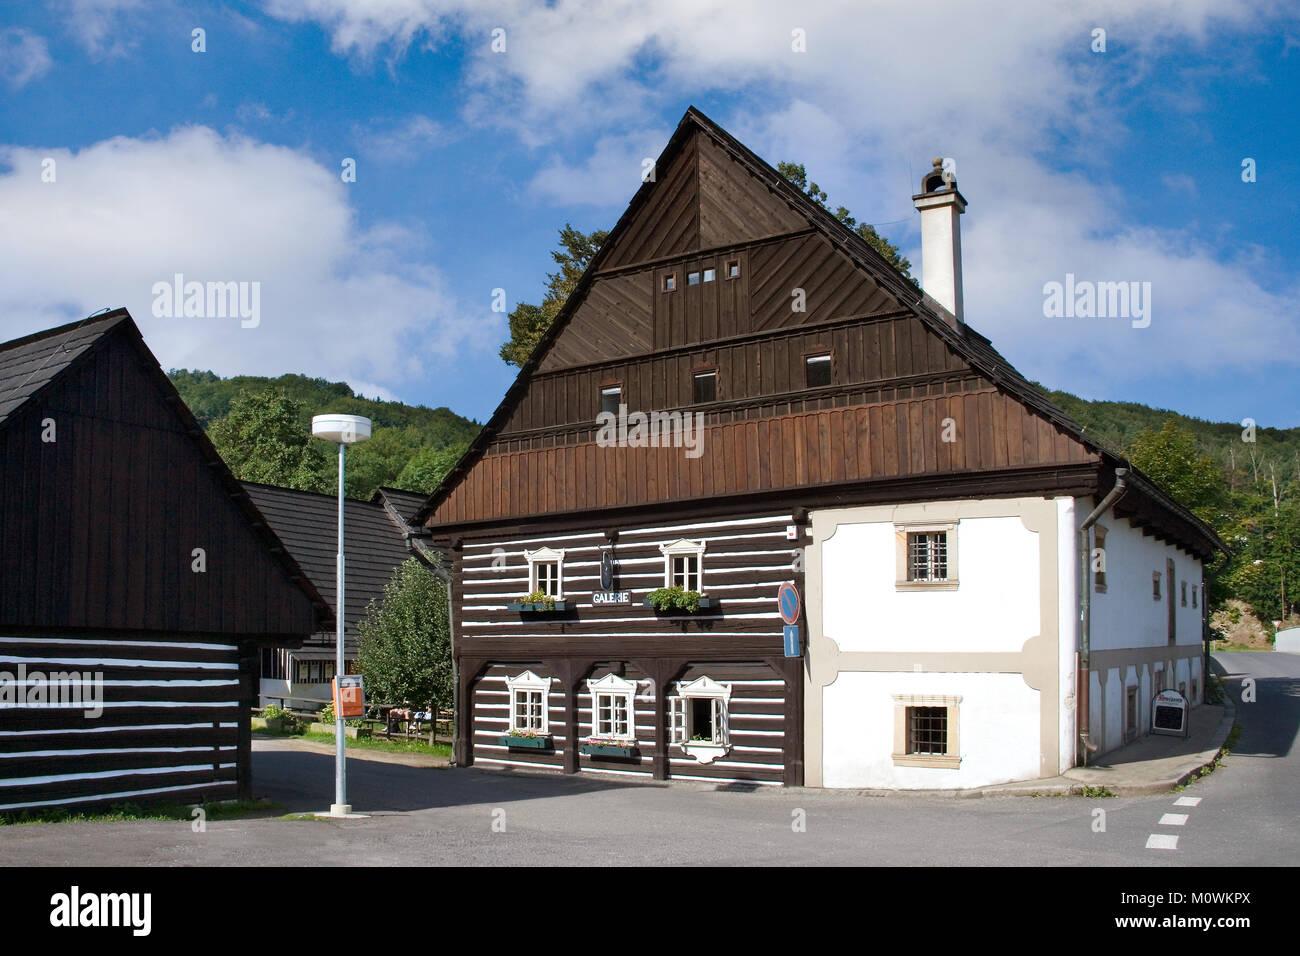 CZECH REPUBLIC, MALA SKALA - AUG 27, 2015: wooden estate Bouckuv statek from 18th cent. in Mala Skala village, Bohemian - Stock Image